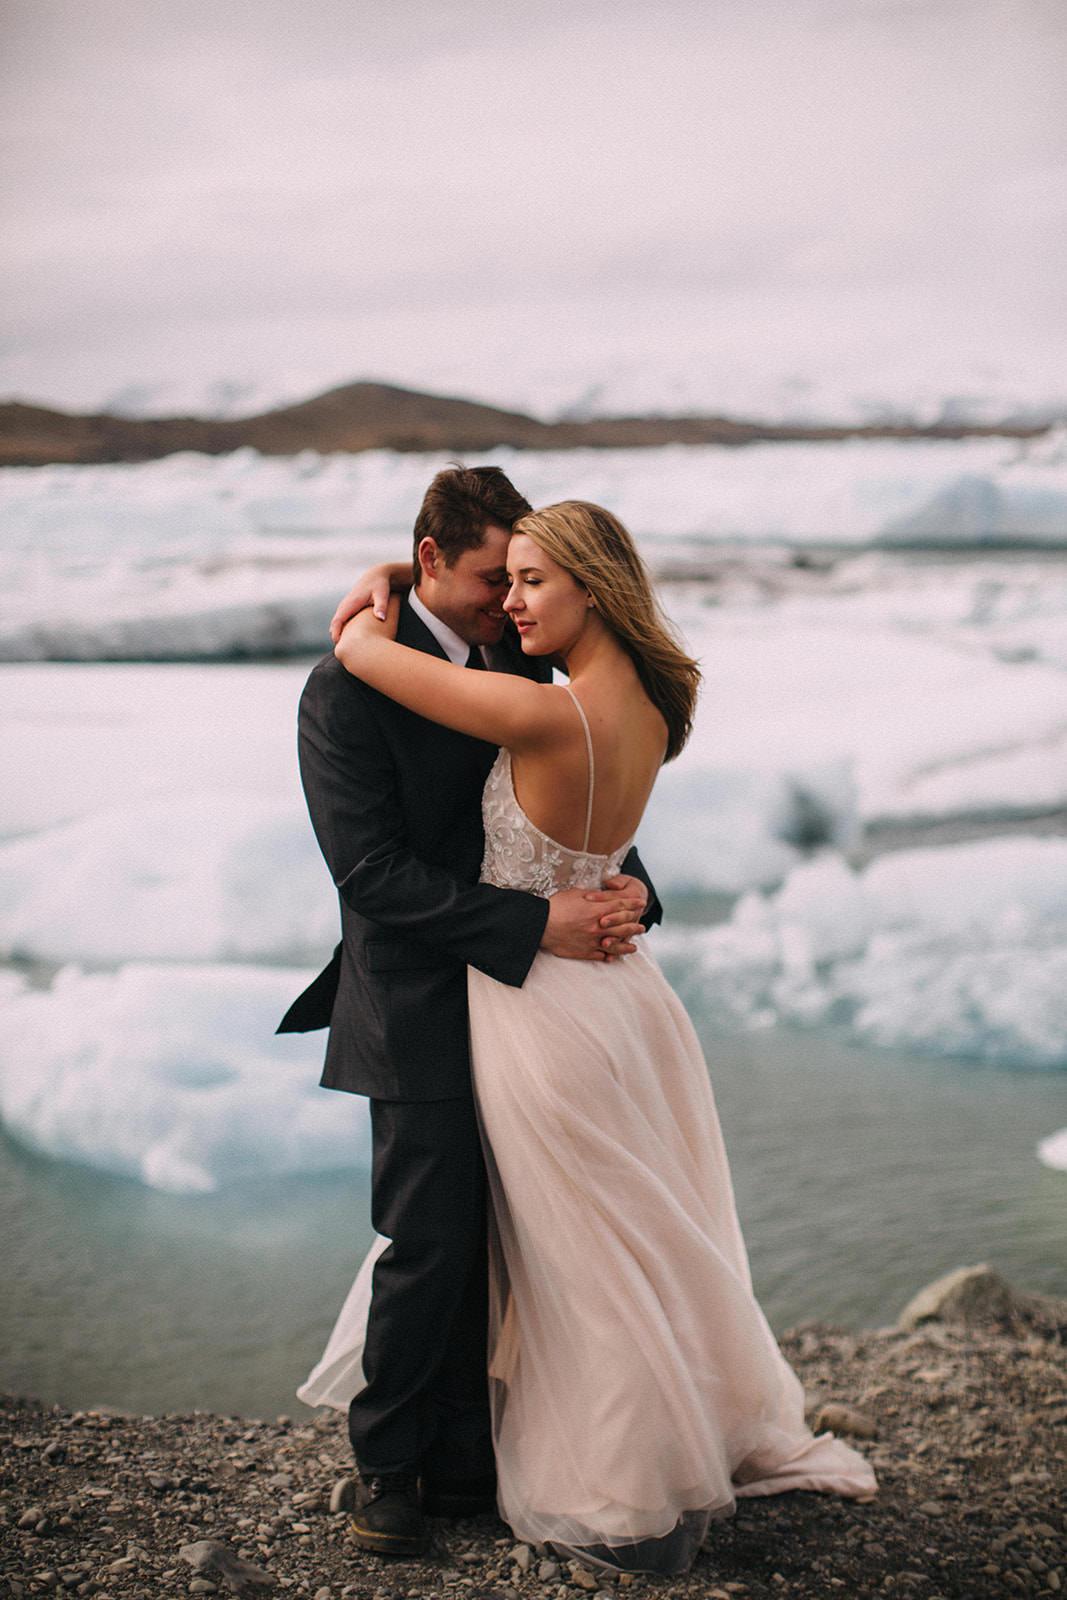 Icelandic Iceland Elopement Wedding Elope Photographer Eloping Reykjavík Vik Black Sand Beach Jökulsárlón Skogafoss Waterfall Vestrahorn Mountain Liz Osban Photography Destination 54.jpg